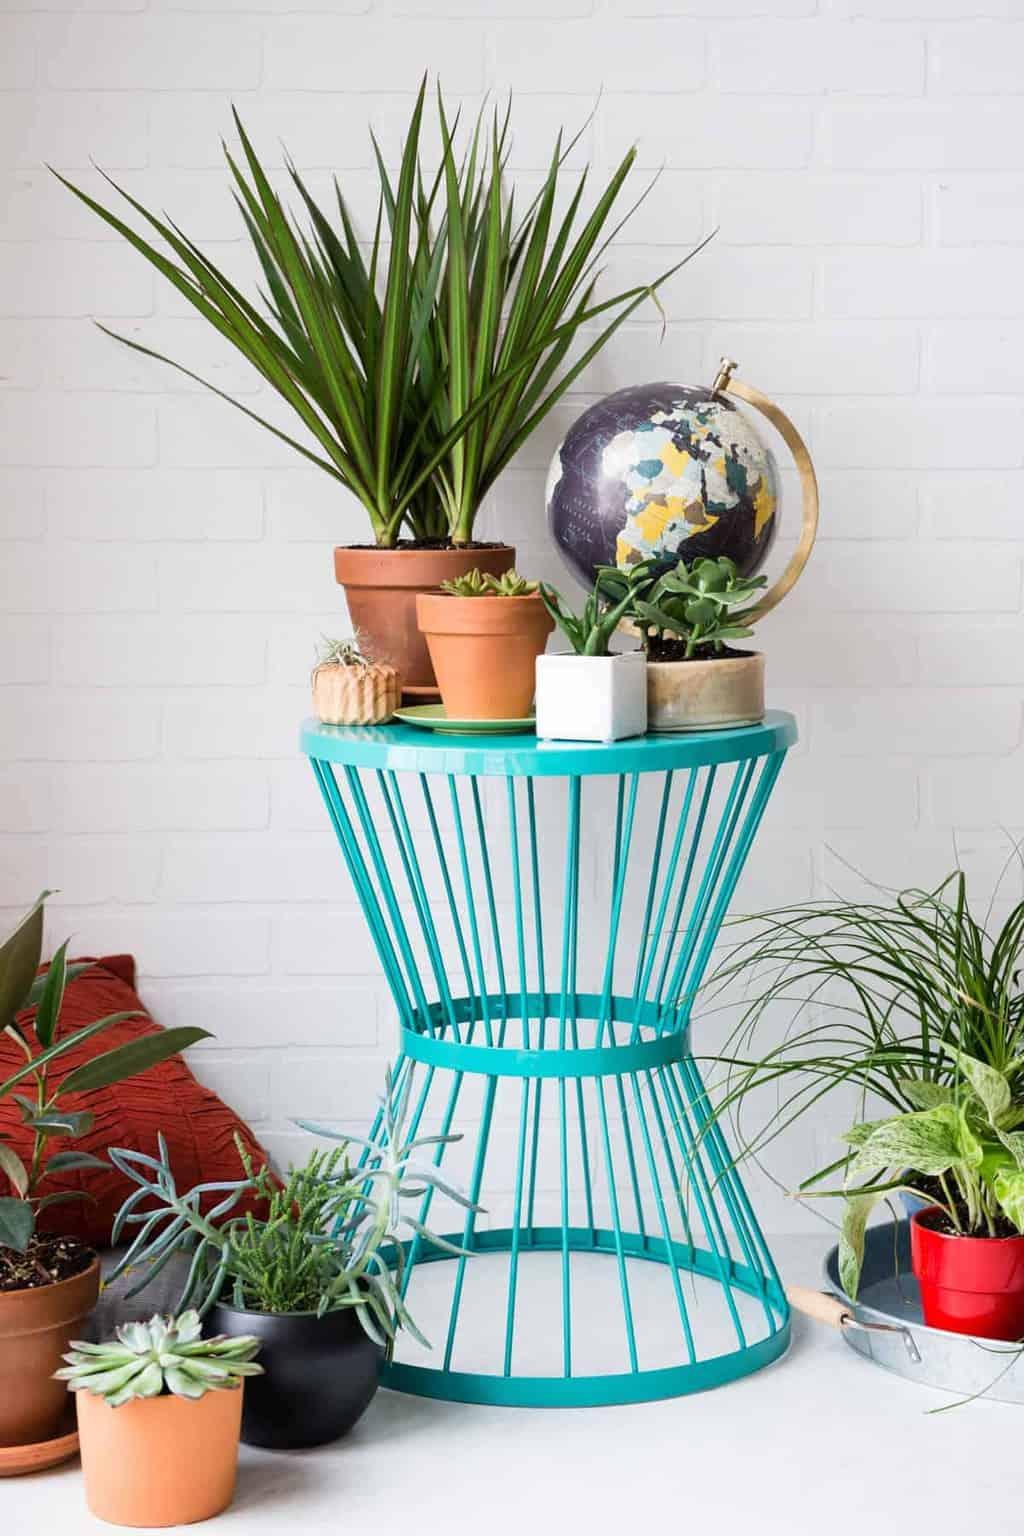 Low Maintenance Plants For Indoors No Plant Care Needed Terrarium